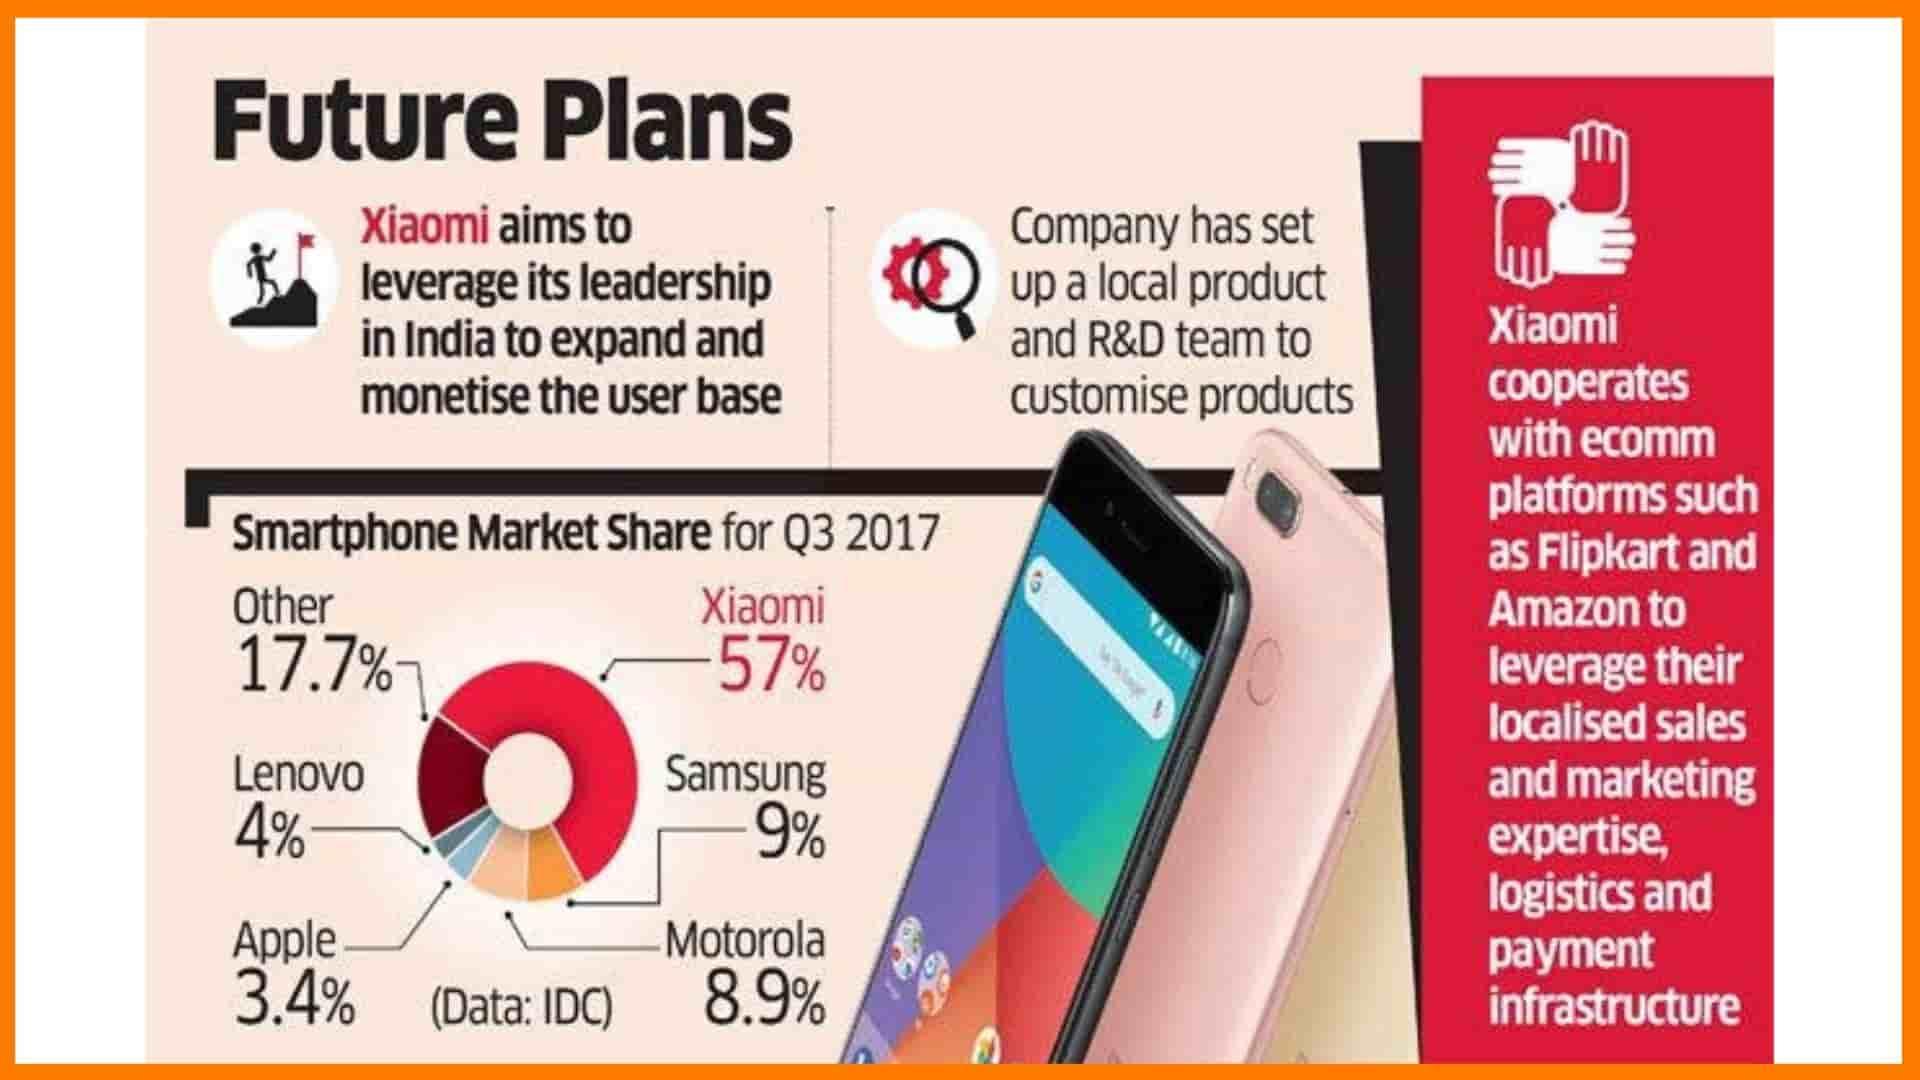 Xiaomi's Future Plans